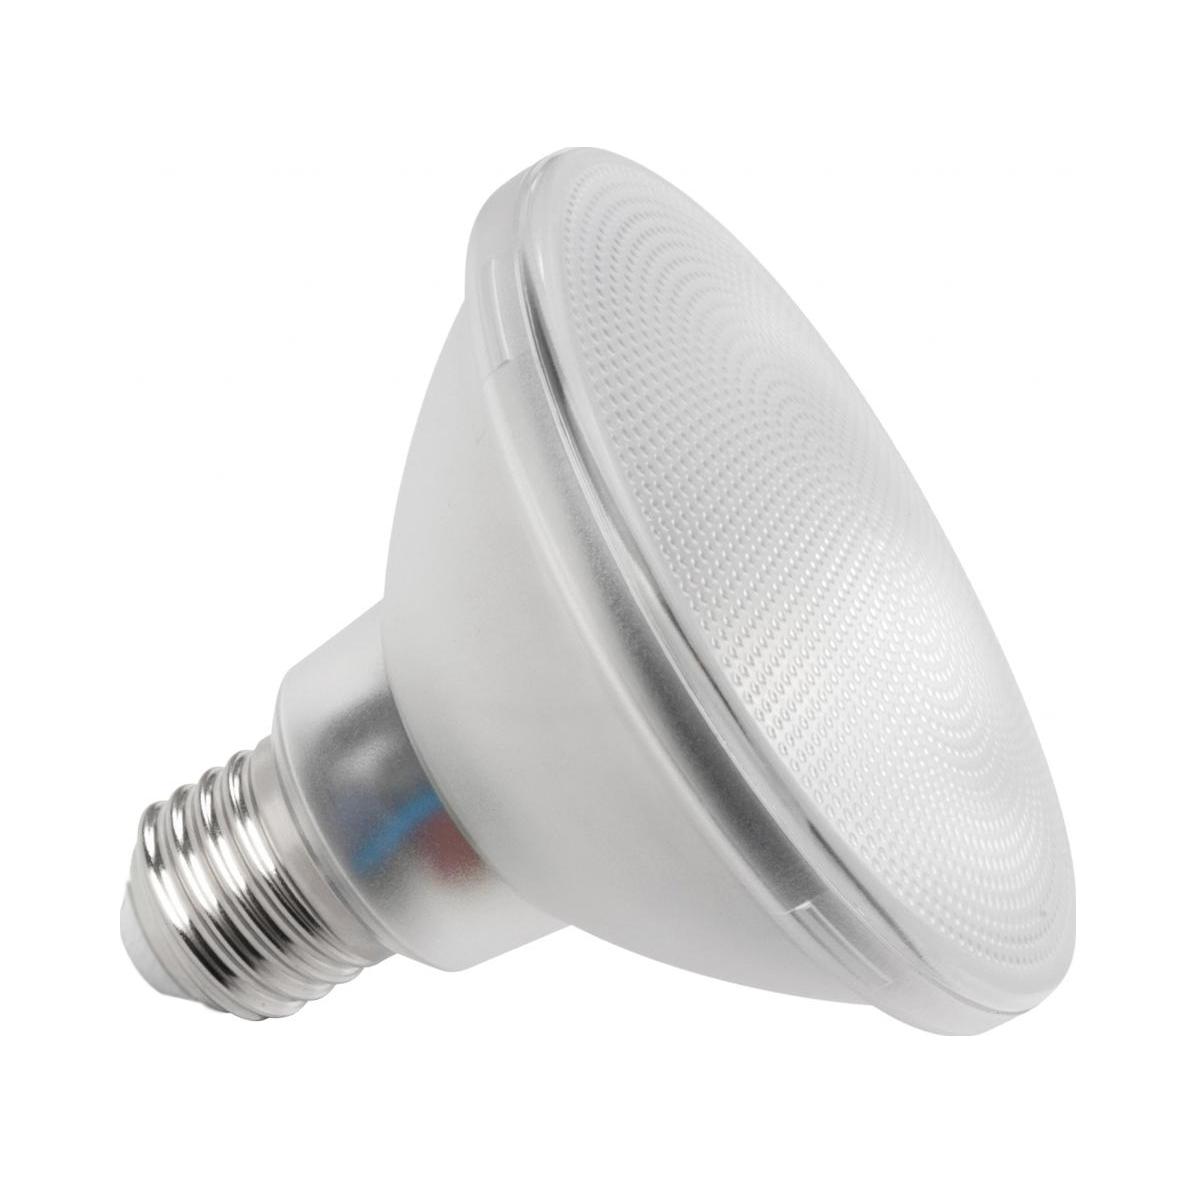 Leuchtmittel Par 30S LED